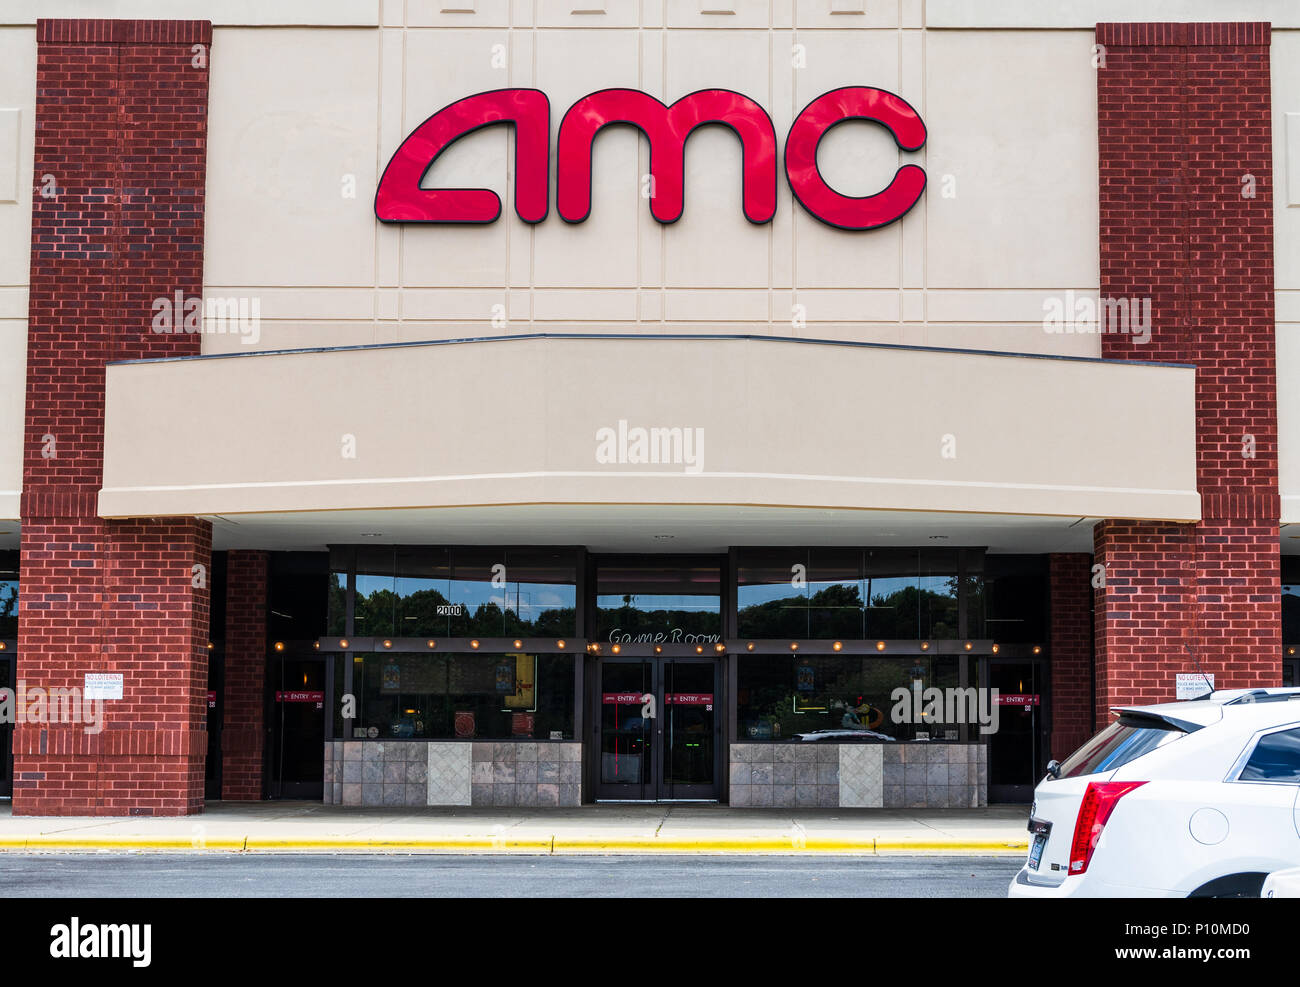 Carmike Hickory Nc >> Cinema Theaters Stock Photos Cinema Theaters Stock Images